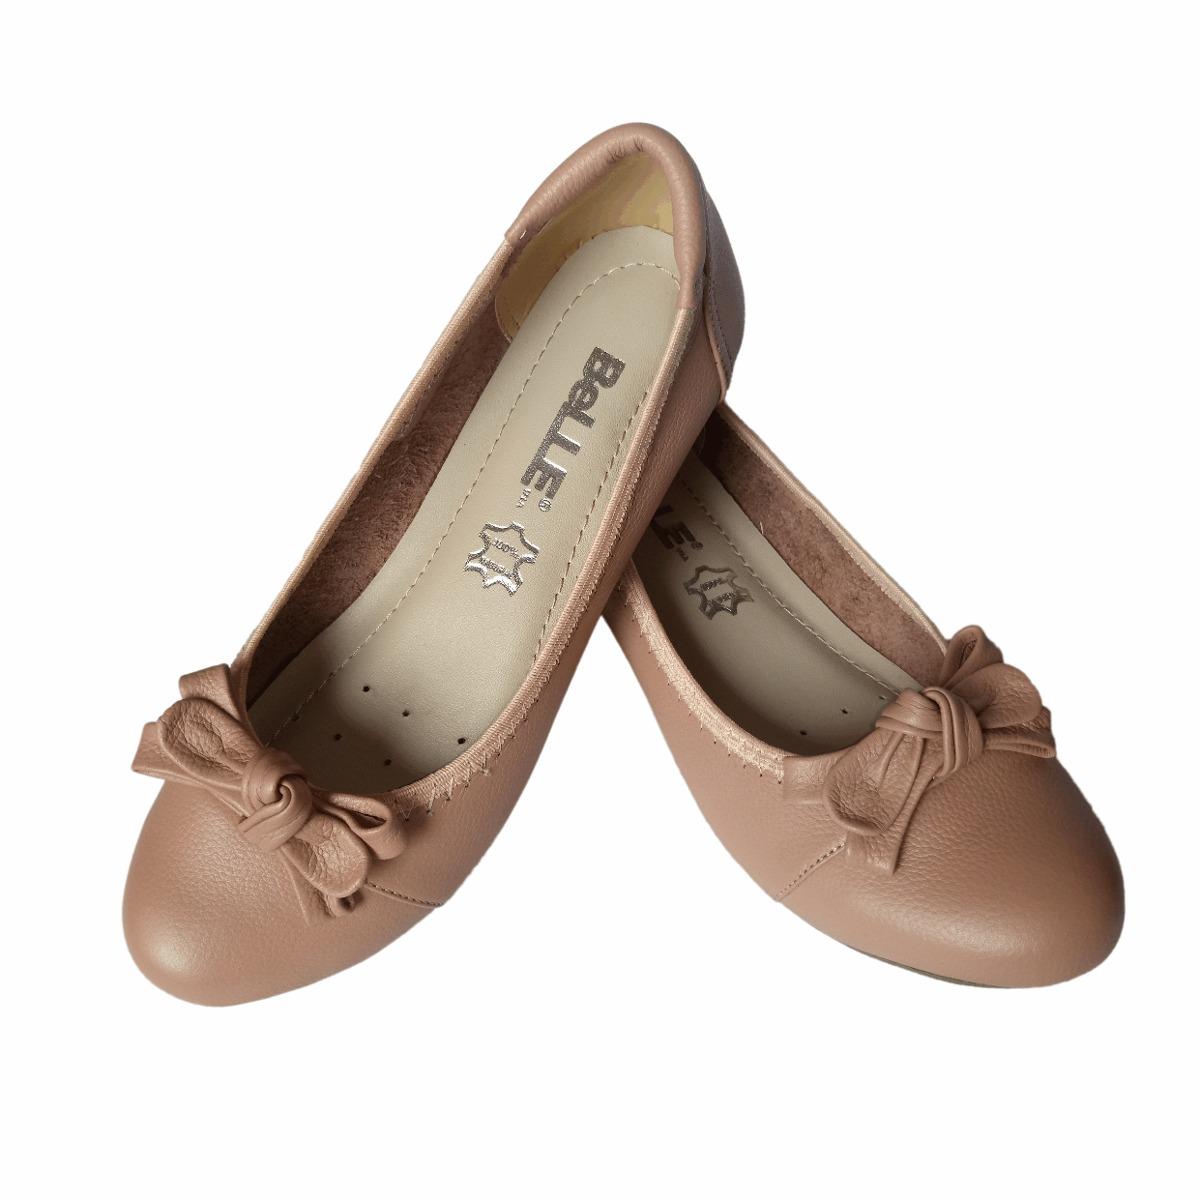 f024161b877 Balerinas - Zapatos - Mujer Cuero Genuino No China - Oferta - S  99 ...